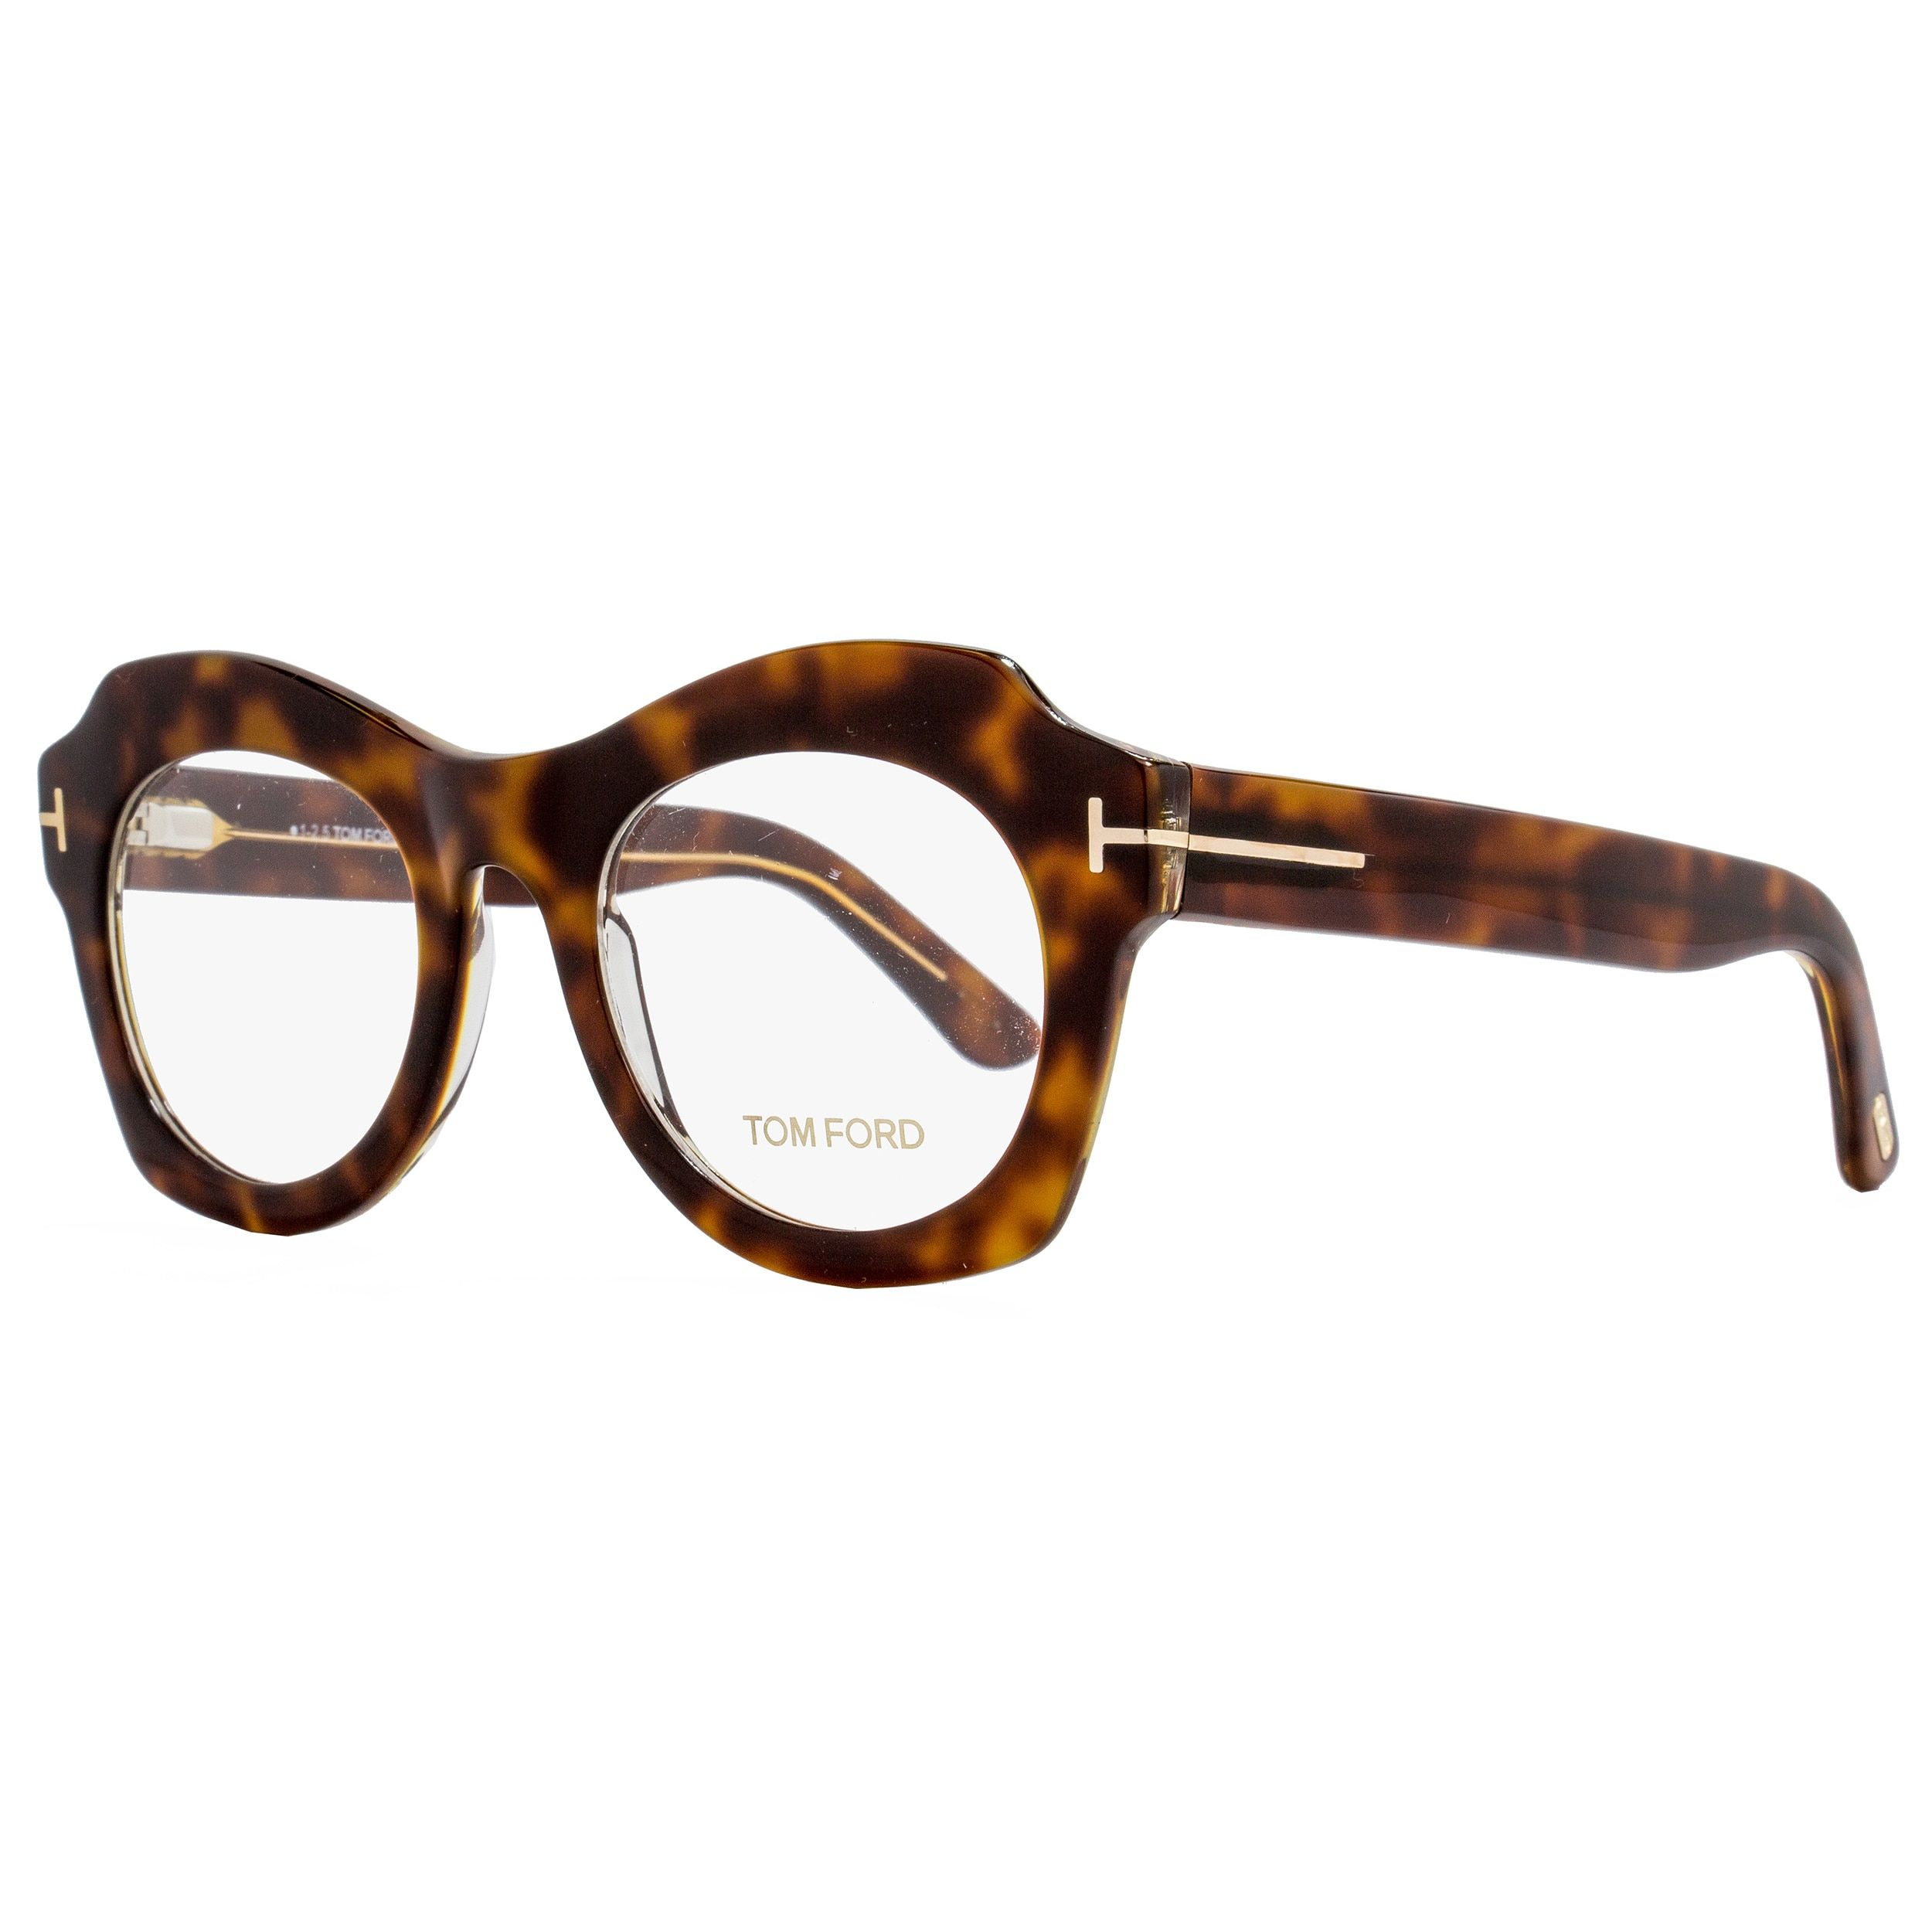 Tom Ford TF5360 056 Womens Brown 49 mm Eyeglasses (49mm) | Pinterest